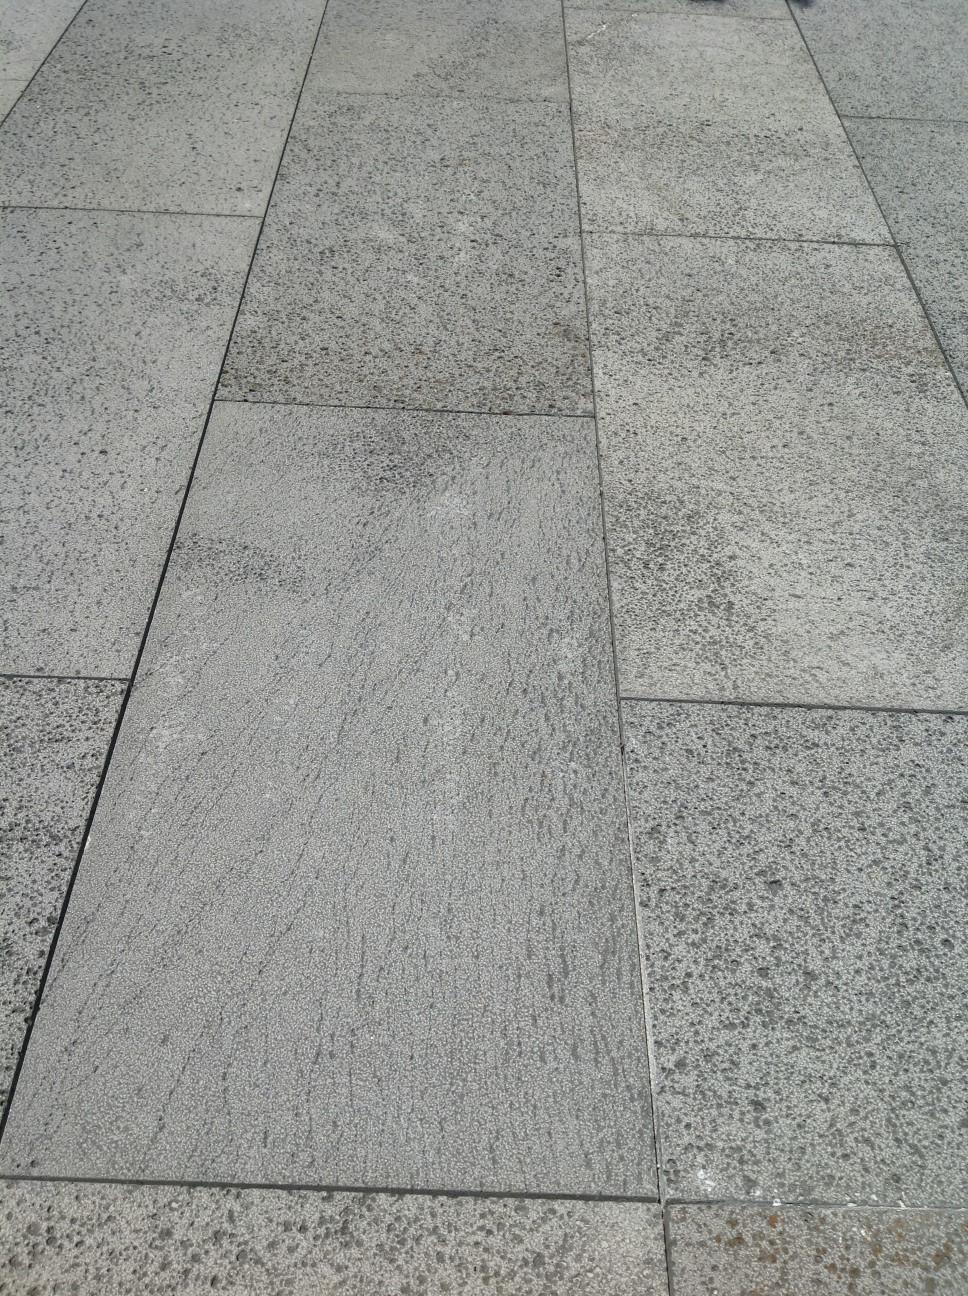 Lavastone paving